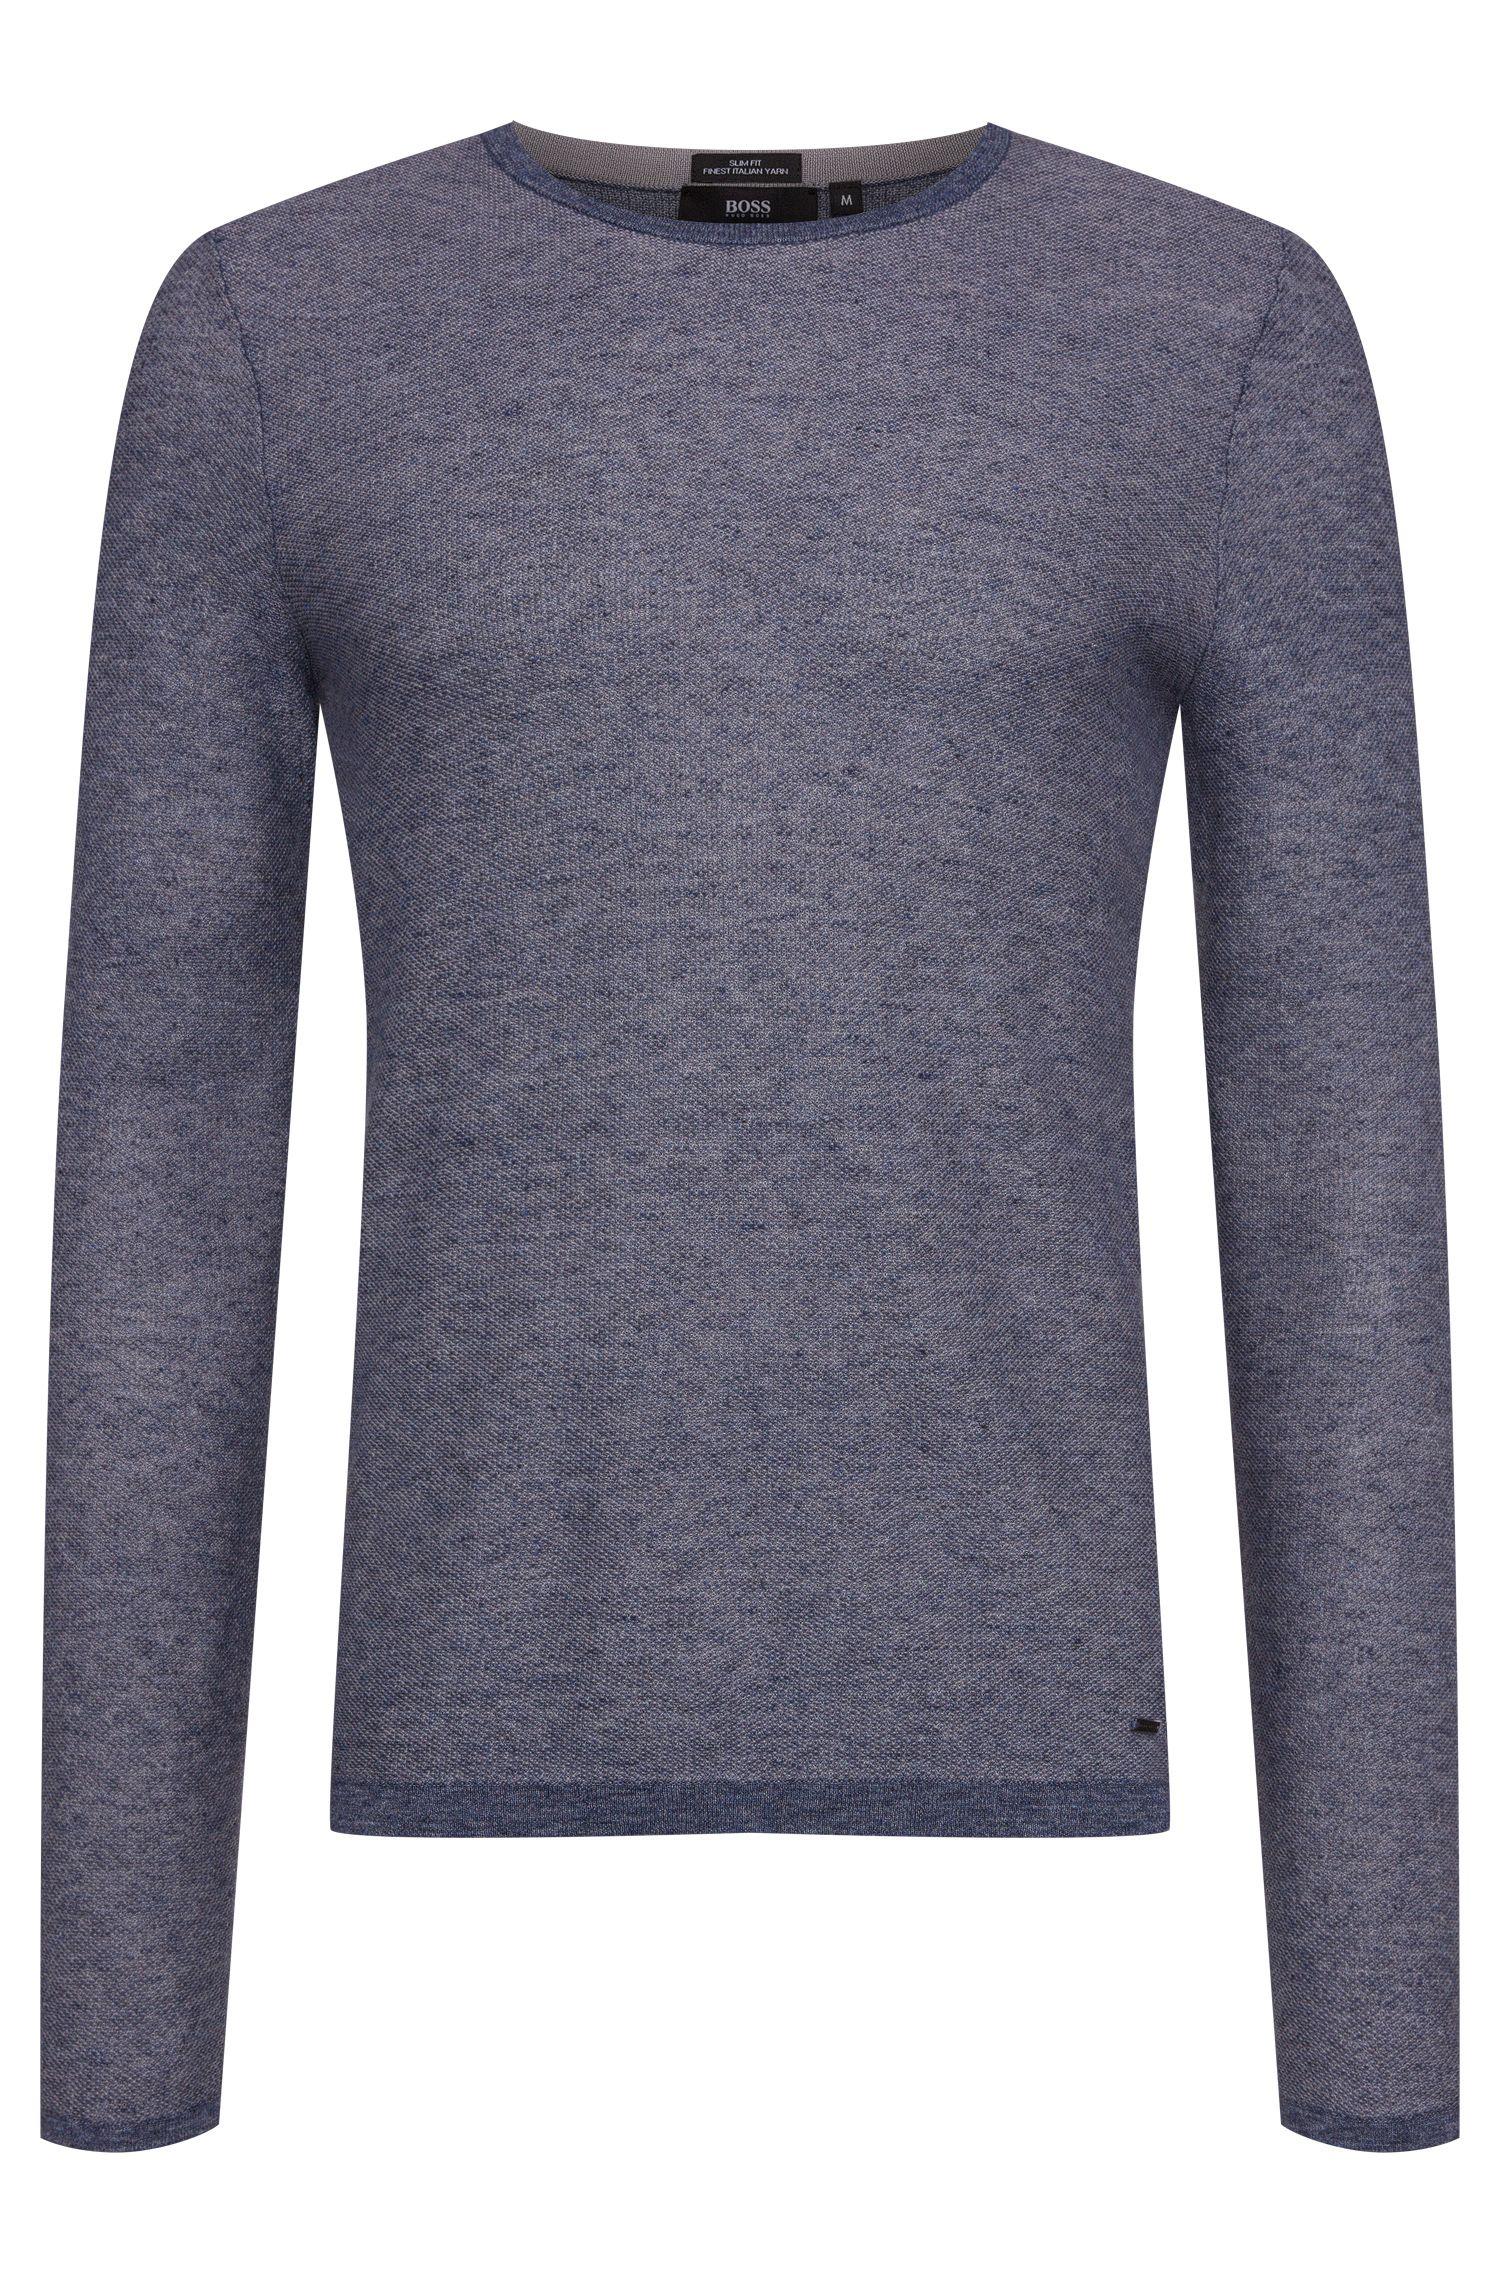 Gemêleerde slim-fit trui van zuivere katoen: 'Hamlett'